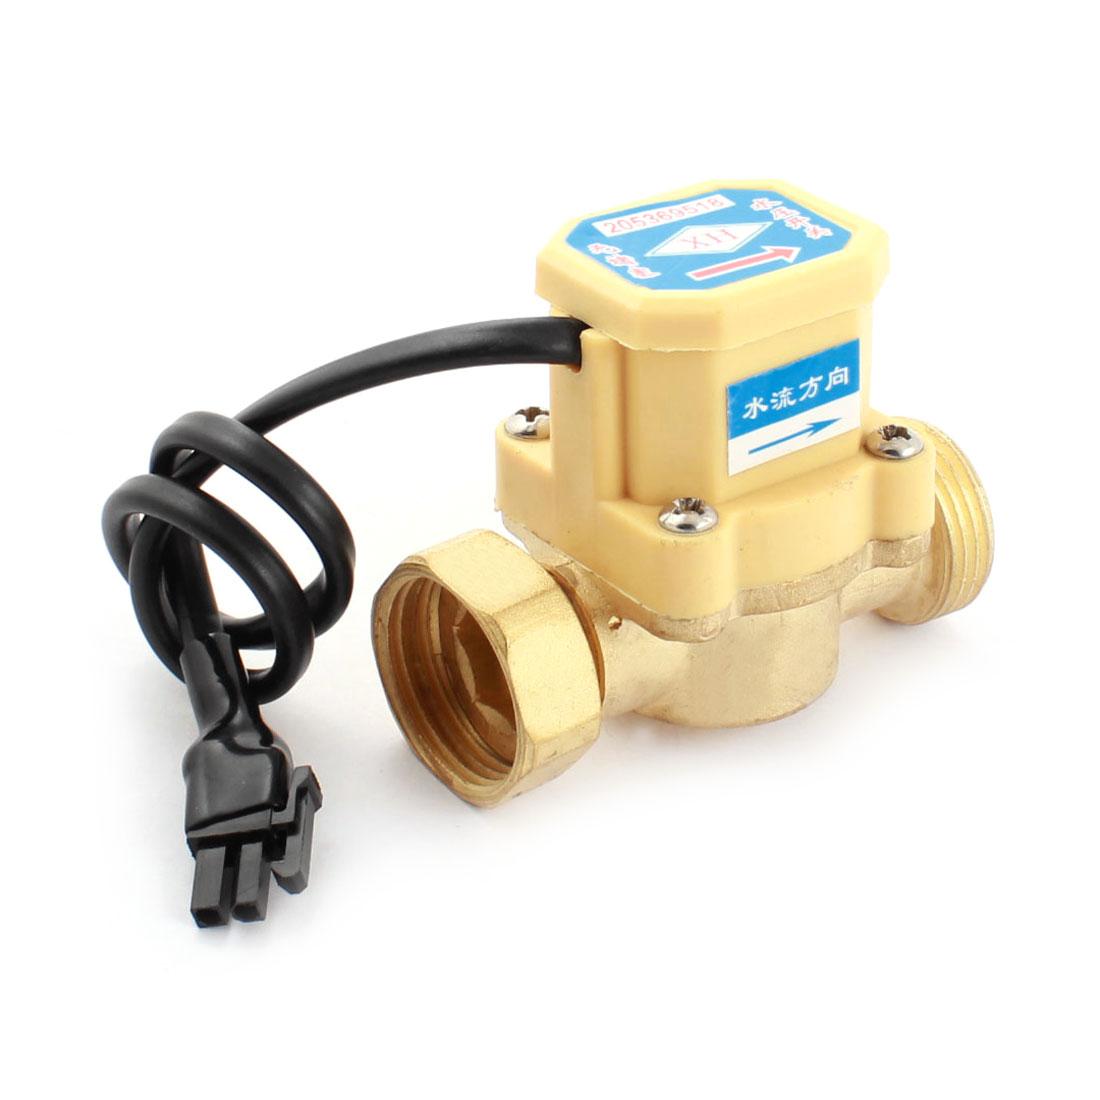 3/4PT Male/Female Thread 0.6Mpa 0.75-5L/min Water Fluid Flow Sensor Control Flowmeter Switch DC 5-18V 260W